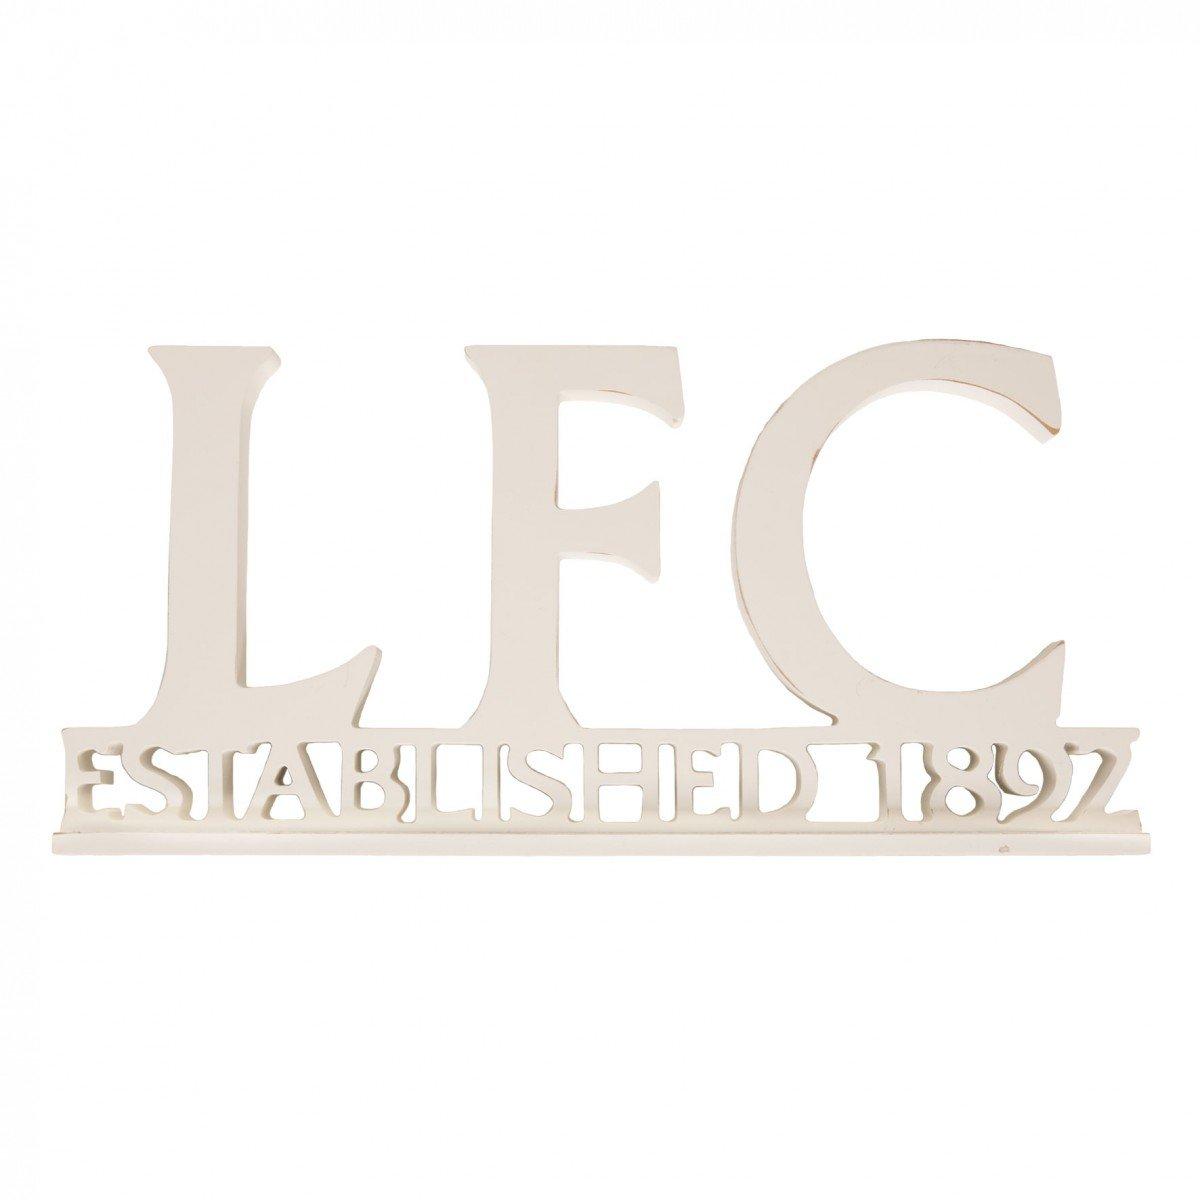 FC Liverpool LFC Schriftzug aus Holz in 40 cm x 18 cm Liverpool F.C. A7198